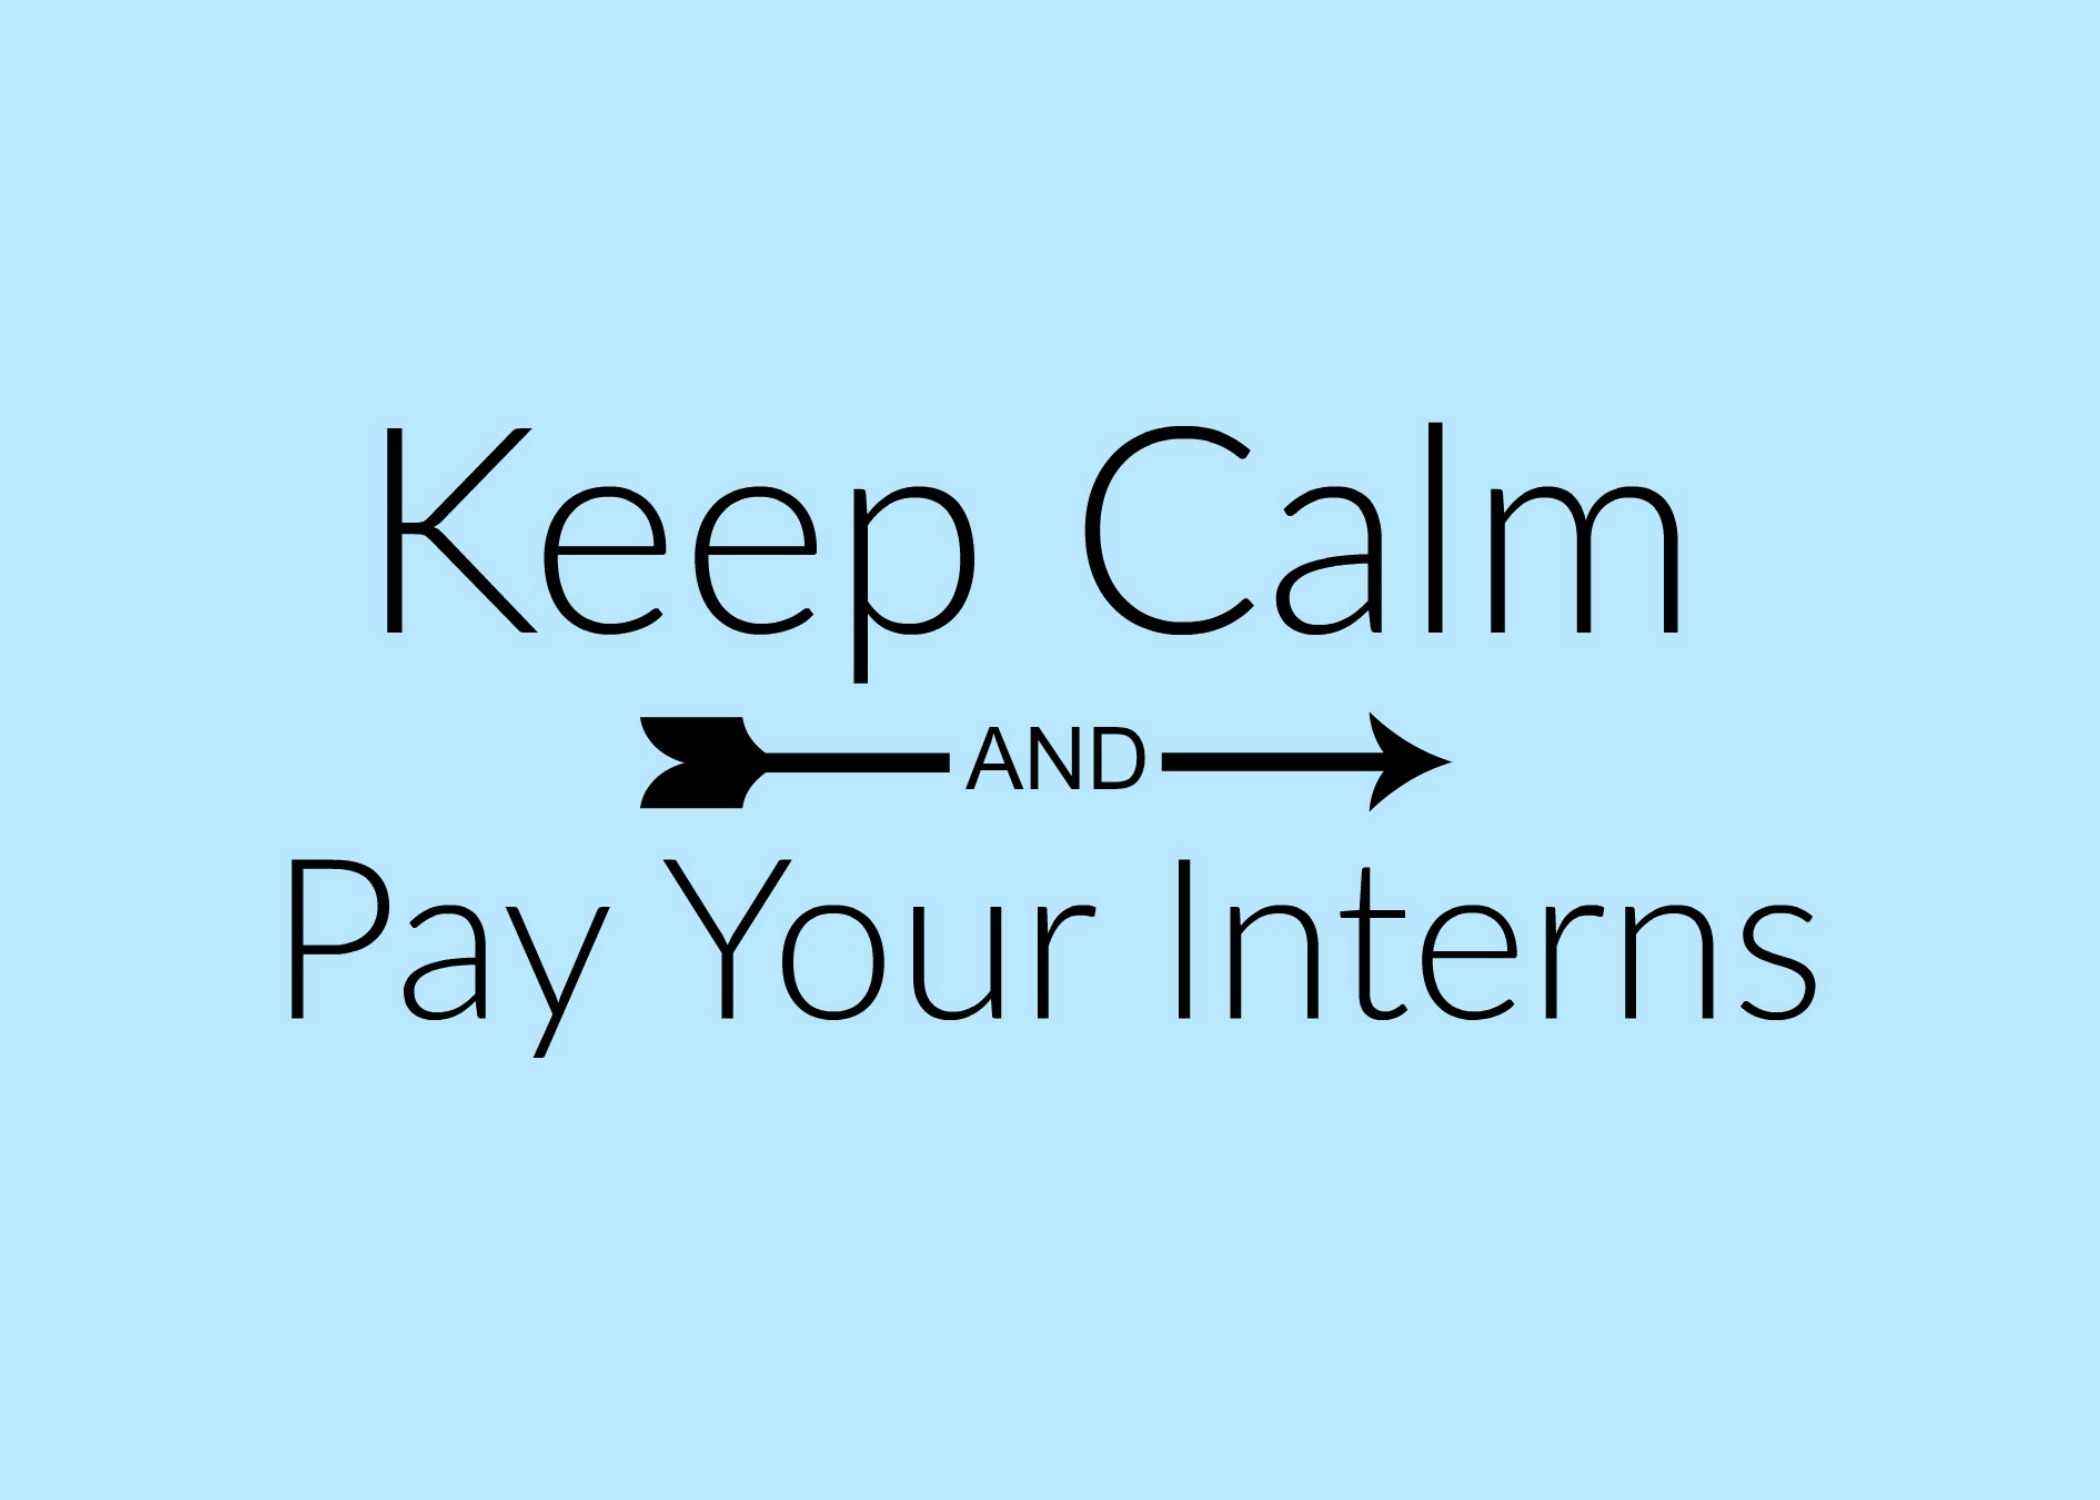 Keep Calm & Pay Your Interns